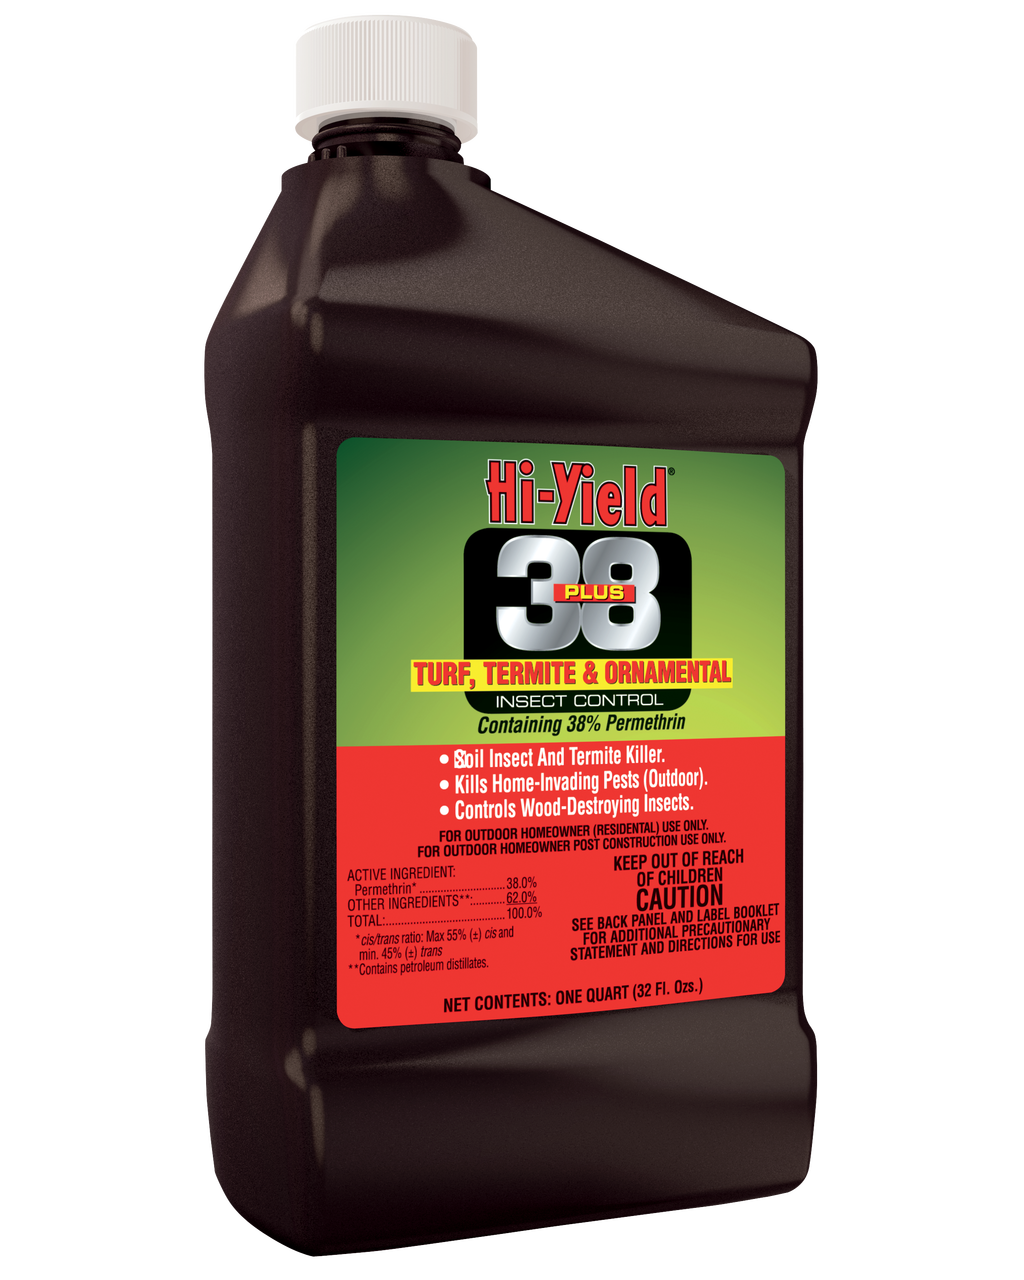 Hi-Yield 38 Plus Turf Termite & Ornamental Insect Control 32oz